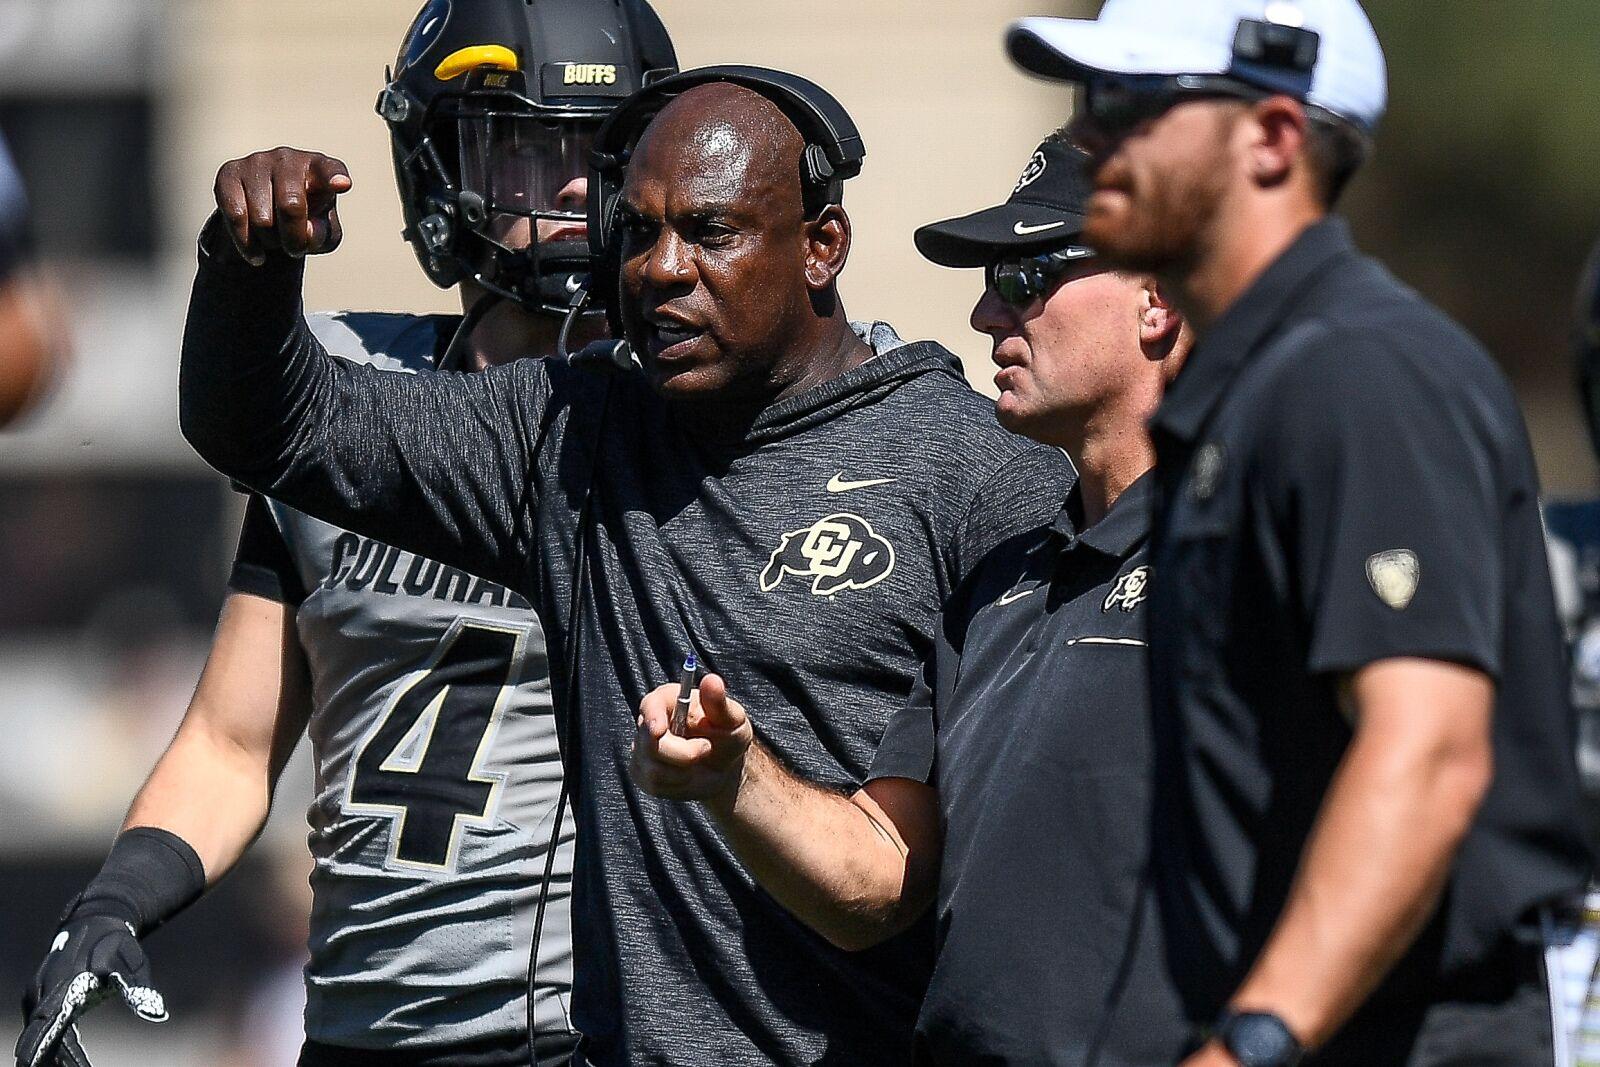 Colorado Football: 3 keys to victory over Arizona State in Week 4